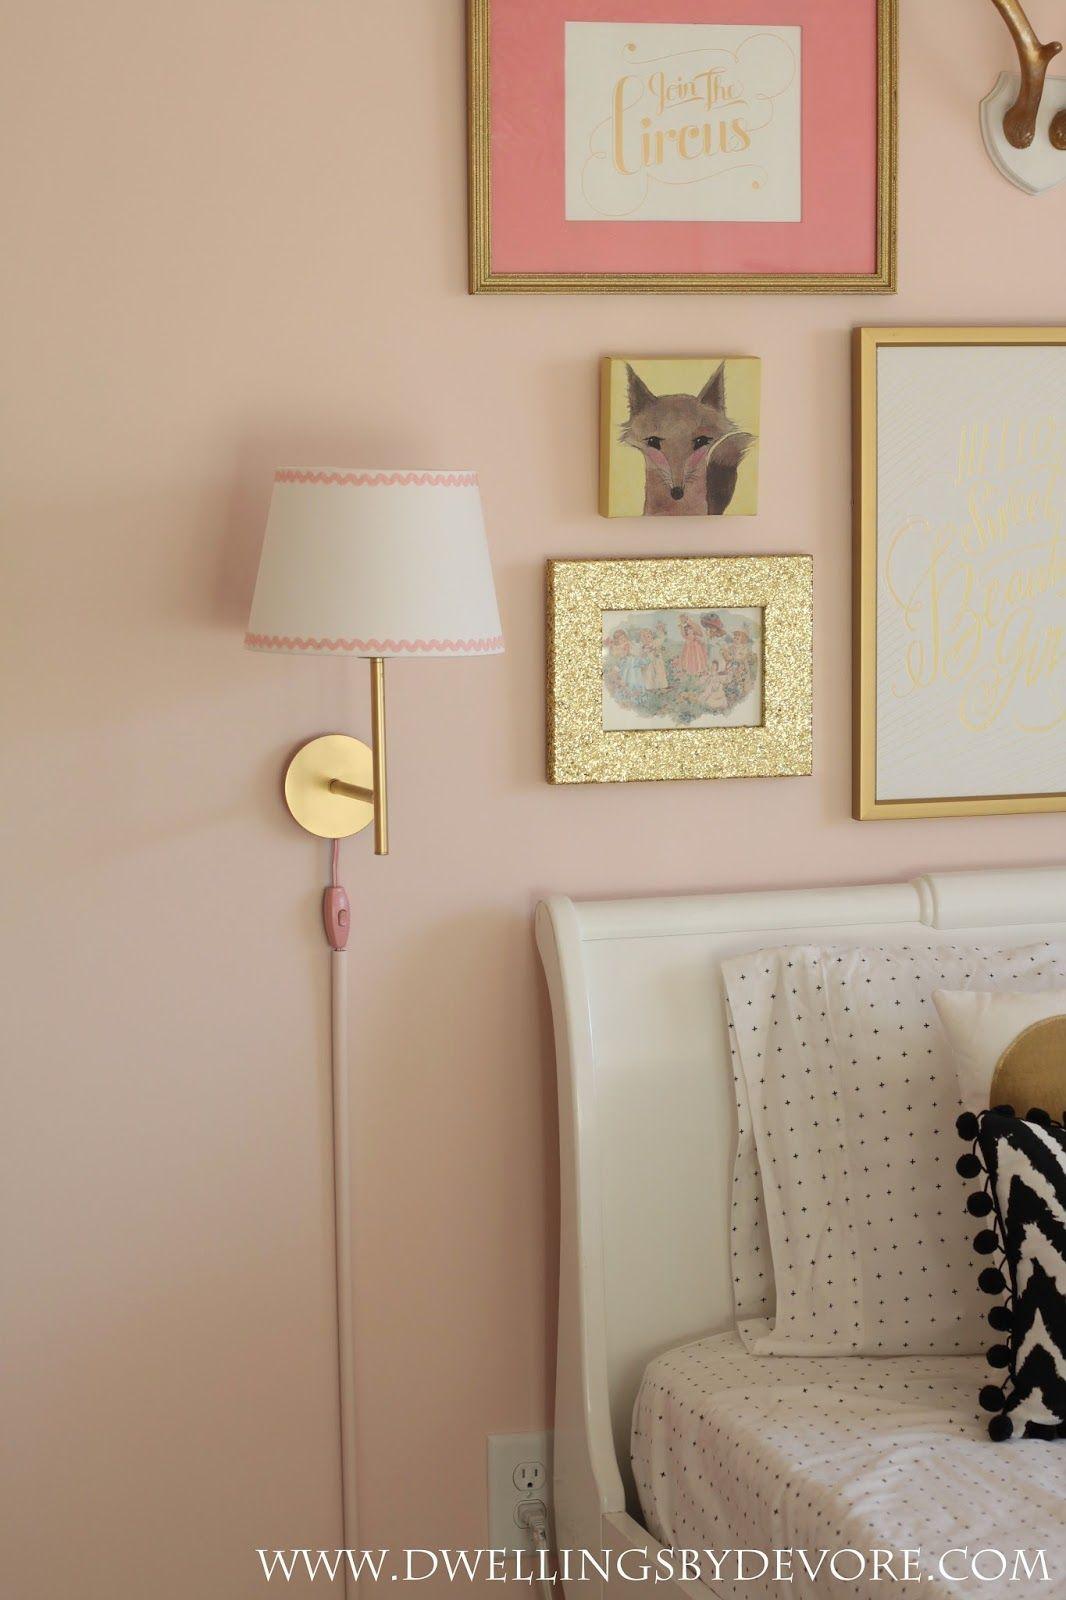 The 25+ best Ikea sconce ideas on Pinterest | Ikea hanging ...